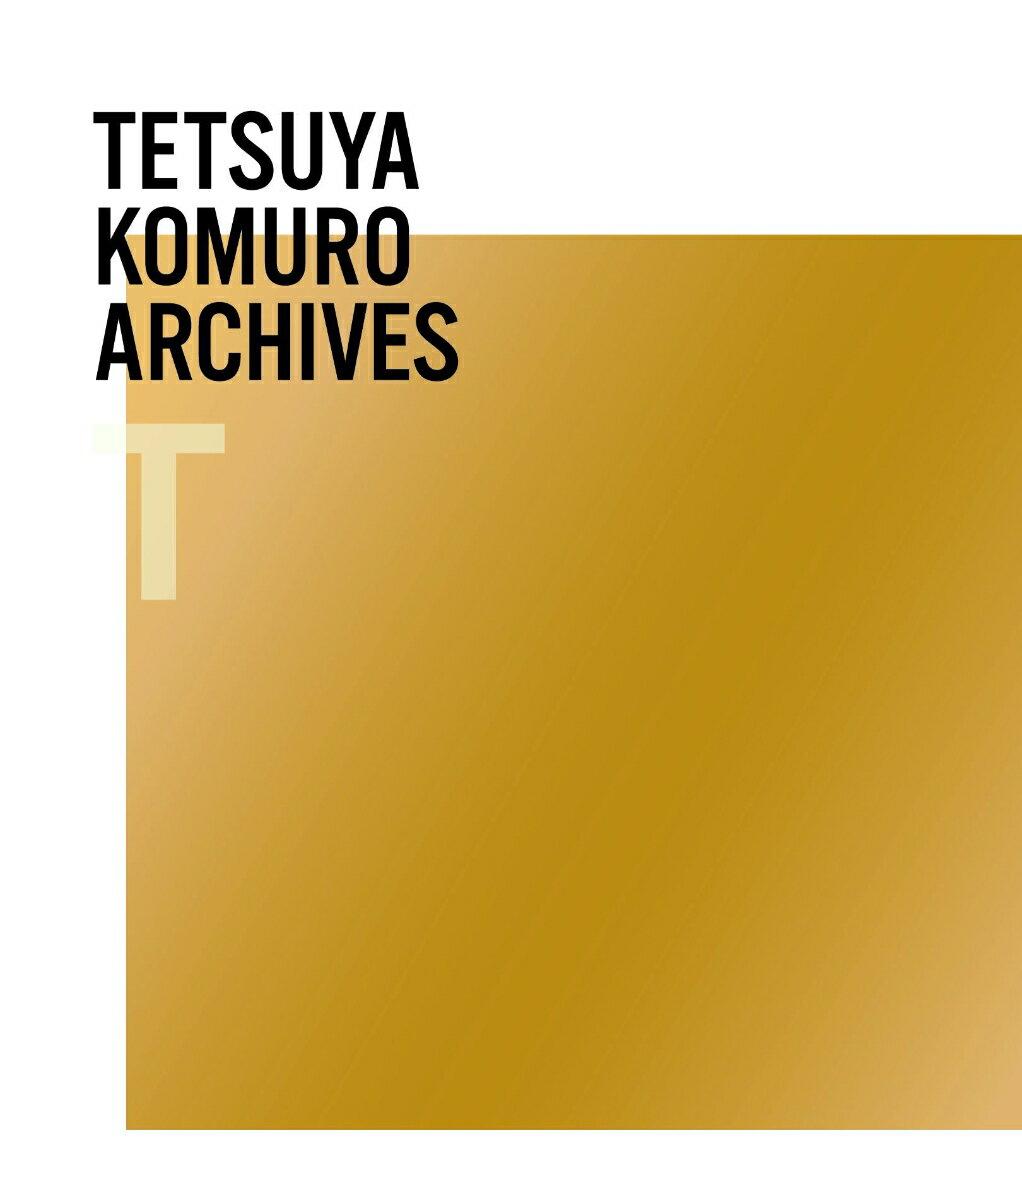 "TETSUYA KOMURO ARCHIVES ""T"" [ (V.A.) ]"